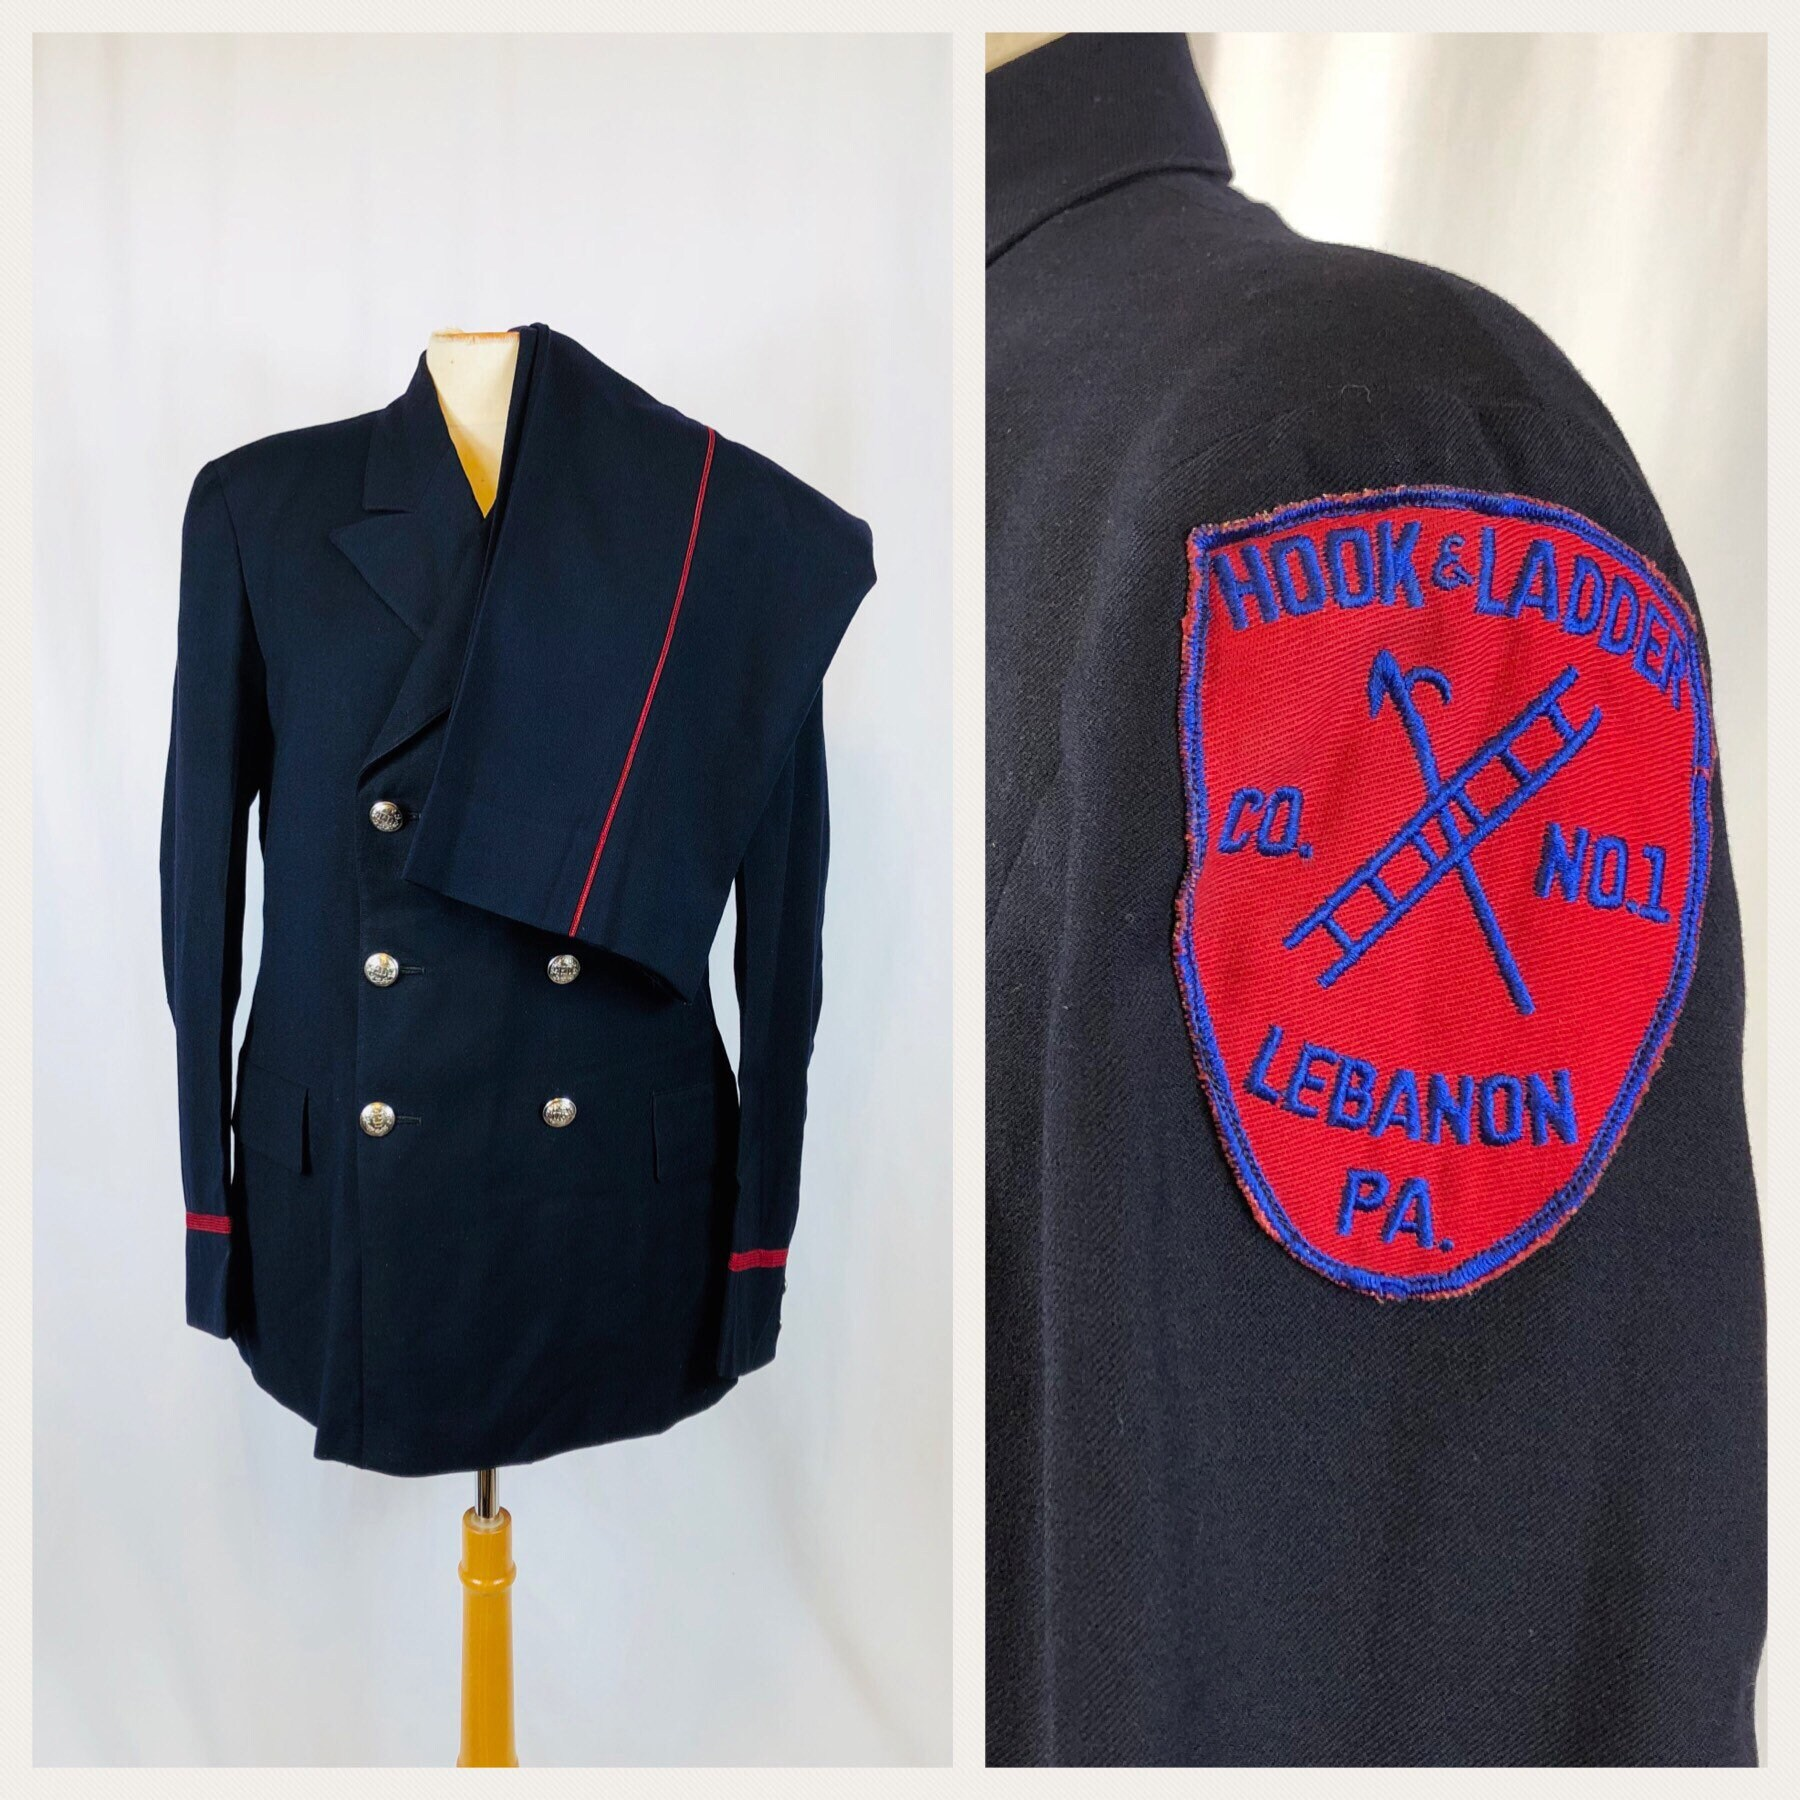 4d3afaa8 1960s Vintage Firefighter Fireman Uniform Suit Fire Department | Etsy